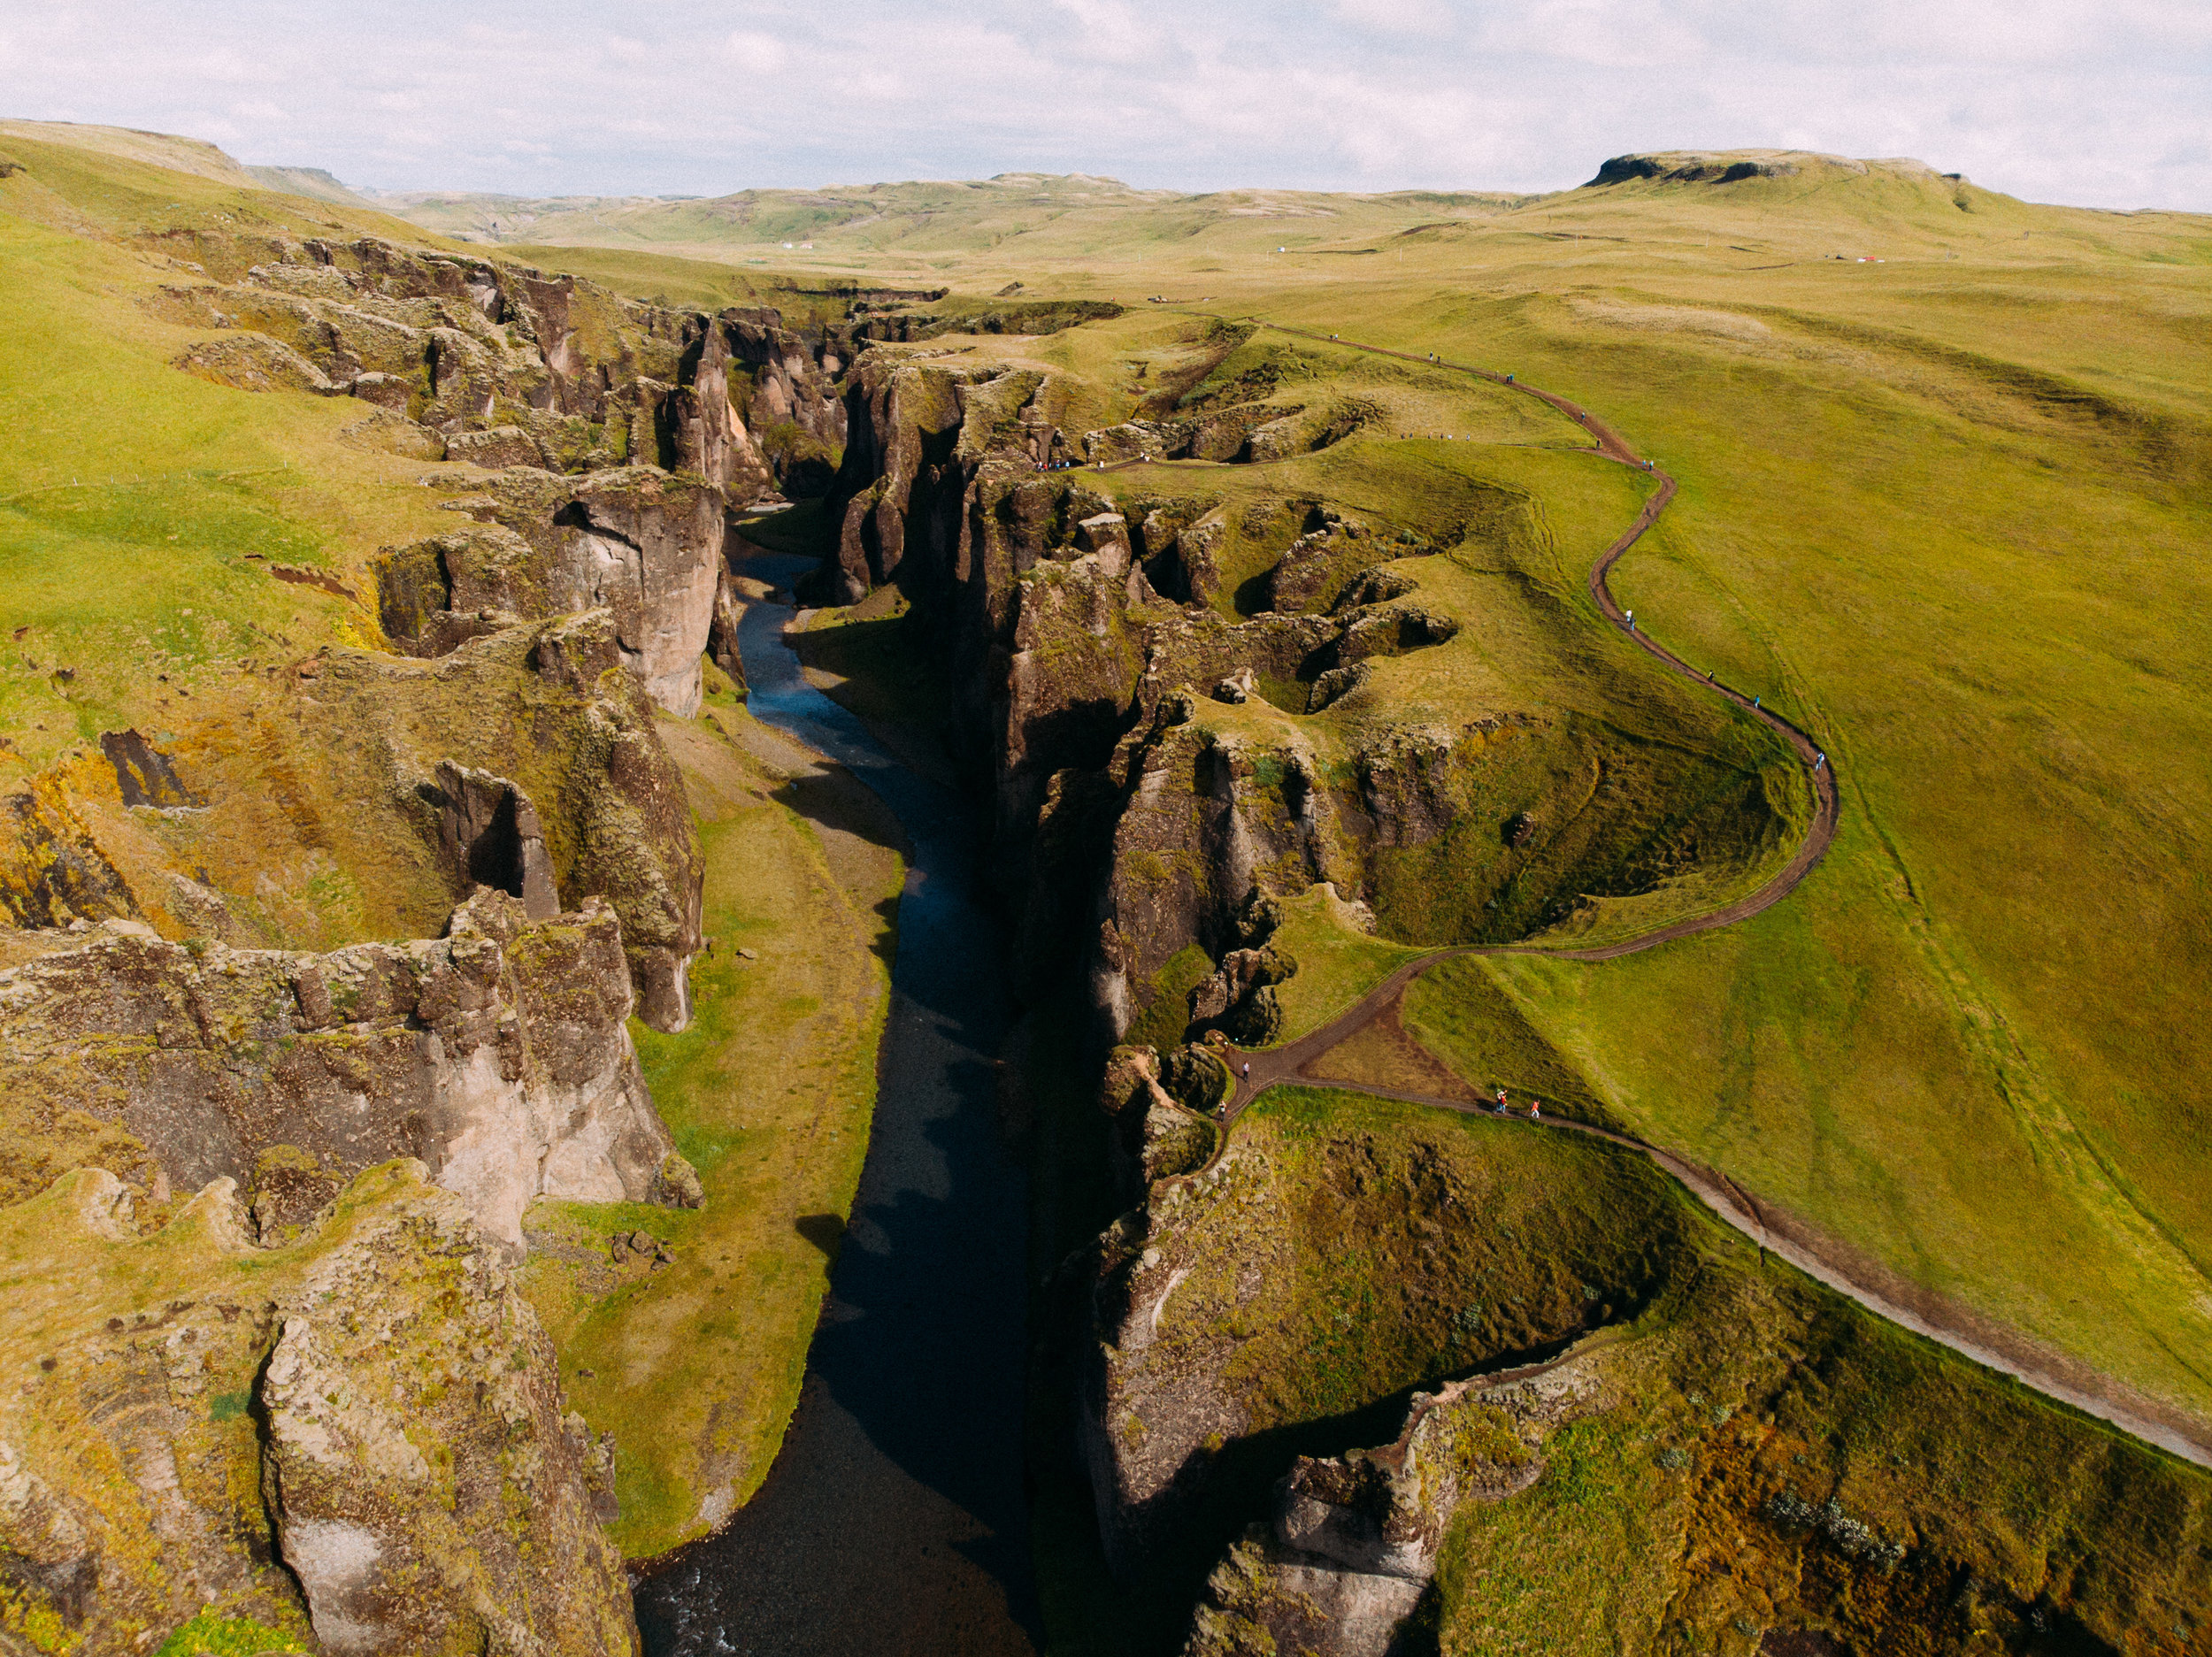 Fjaðrárgljúfur - [ 63.6736749,-18.4691622]  DJI Mavic Air Drone